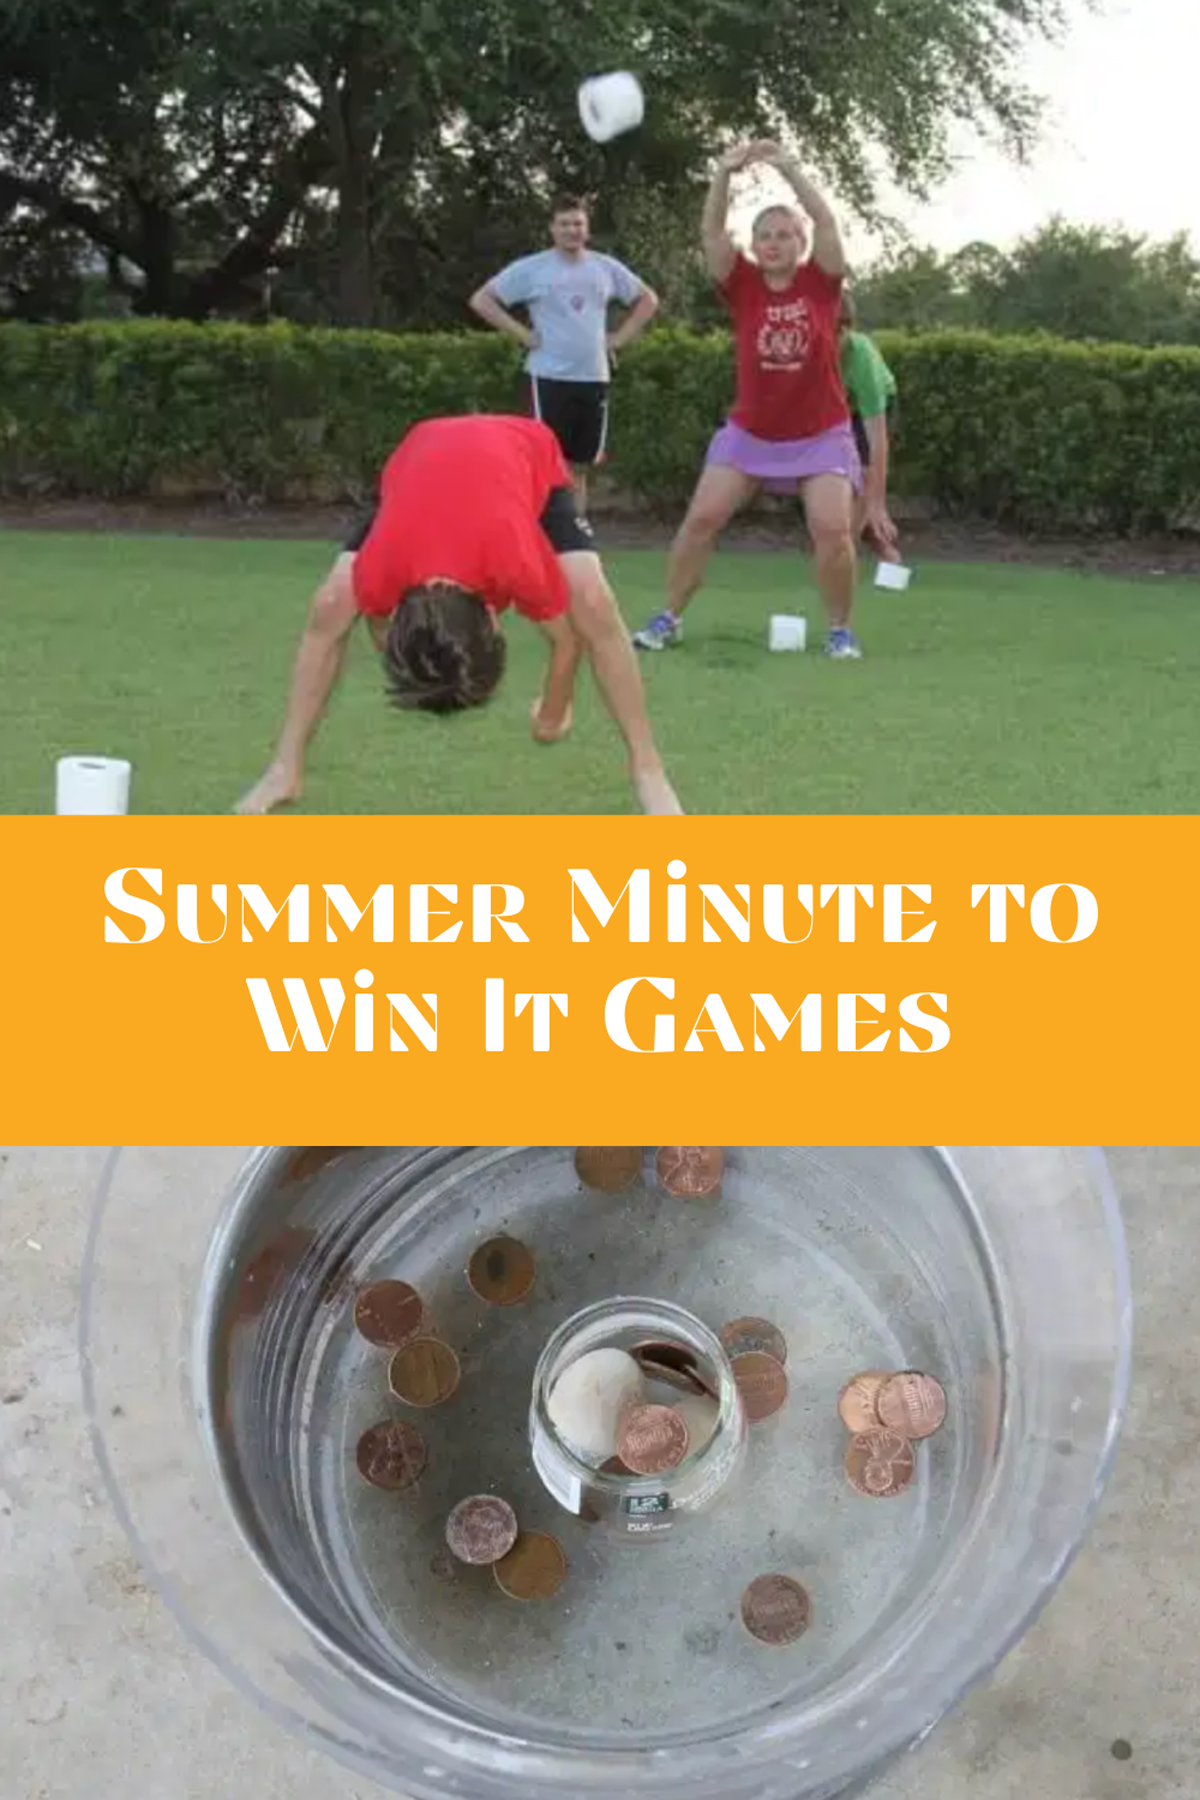 Summer Minute to Win It Games Backyard